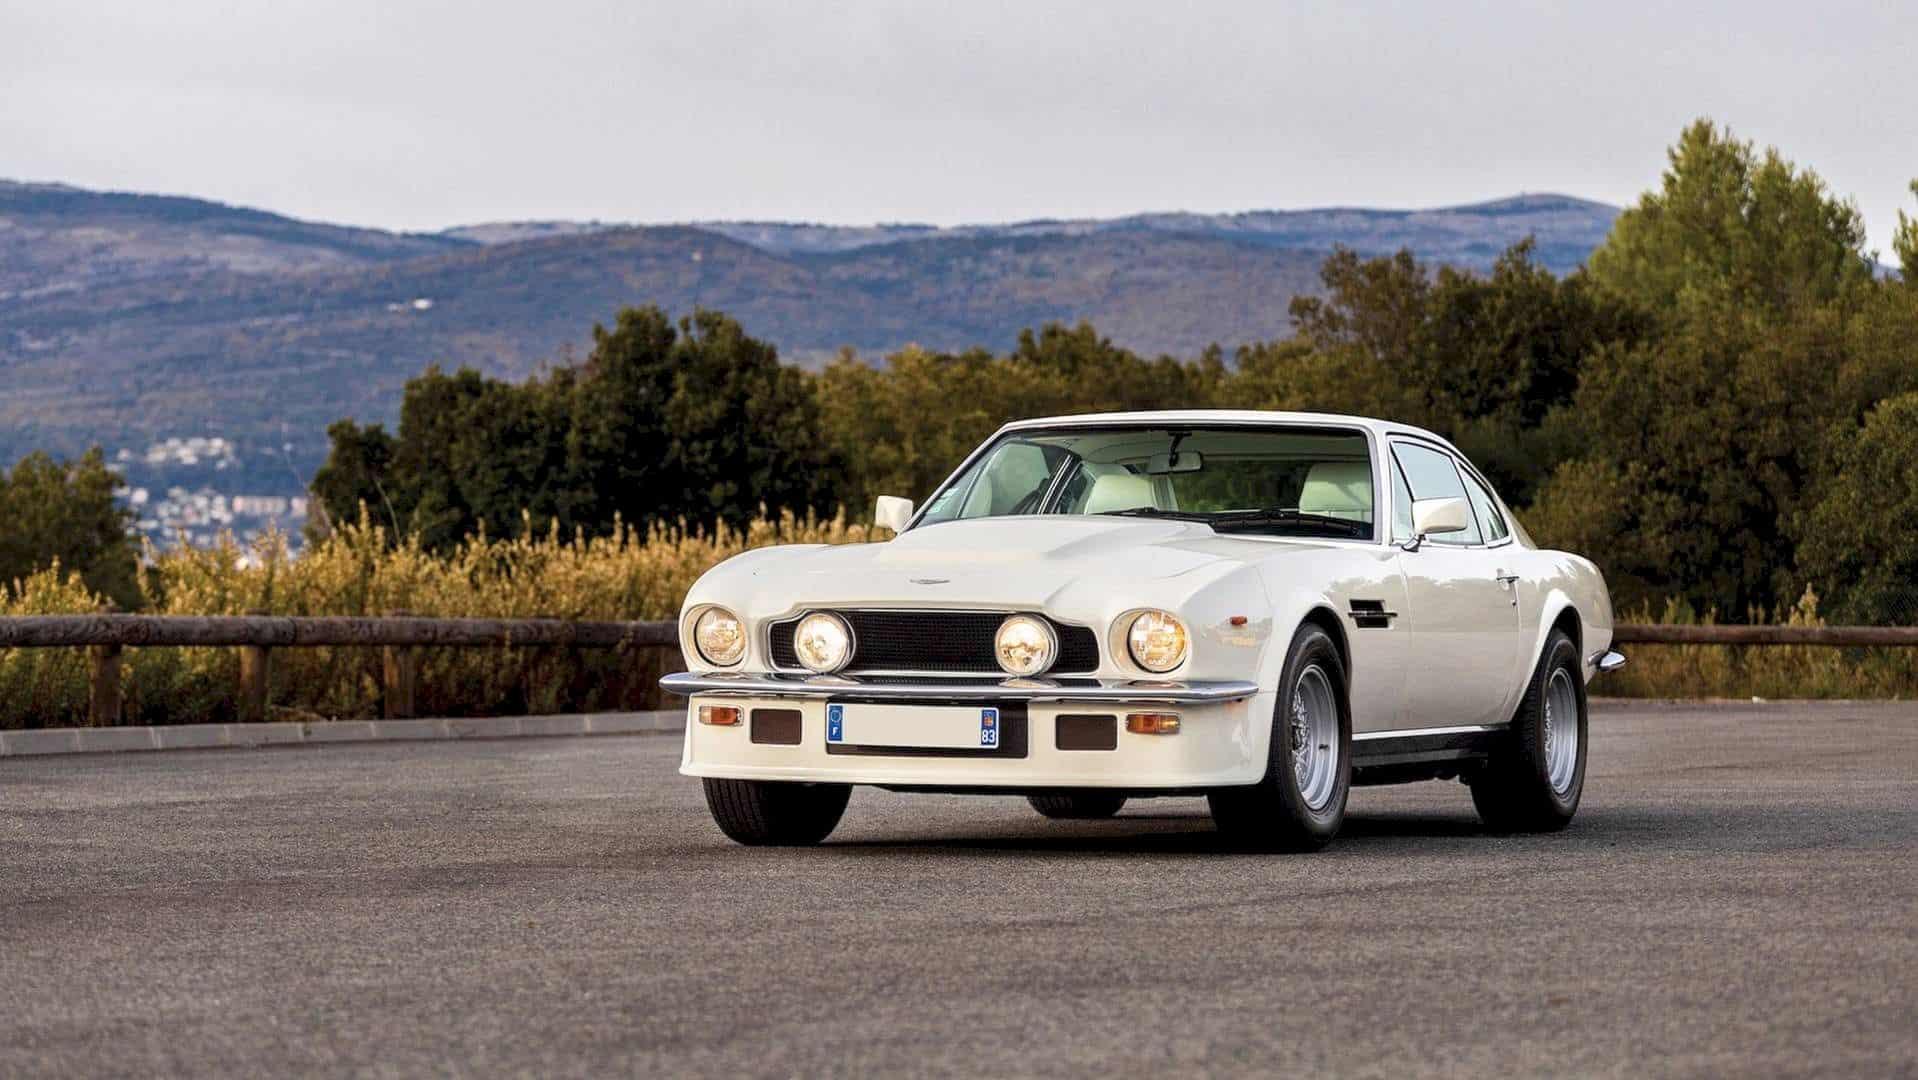 1983 Aston Martin V8 Vantage V580 5